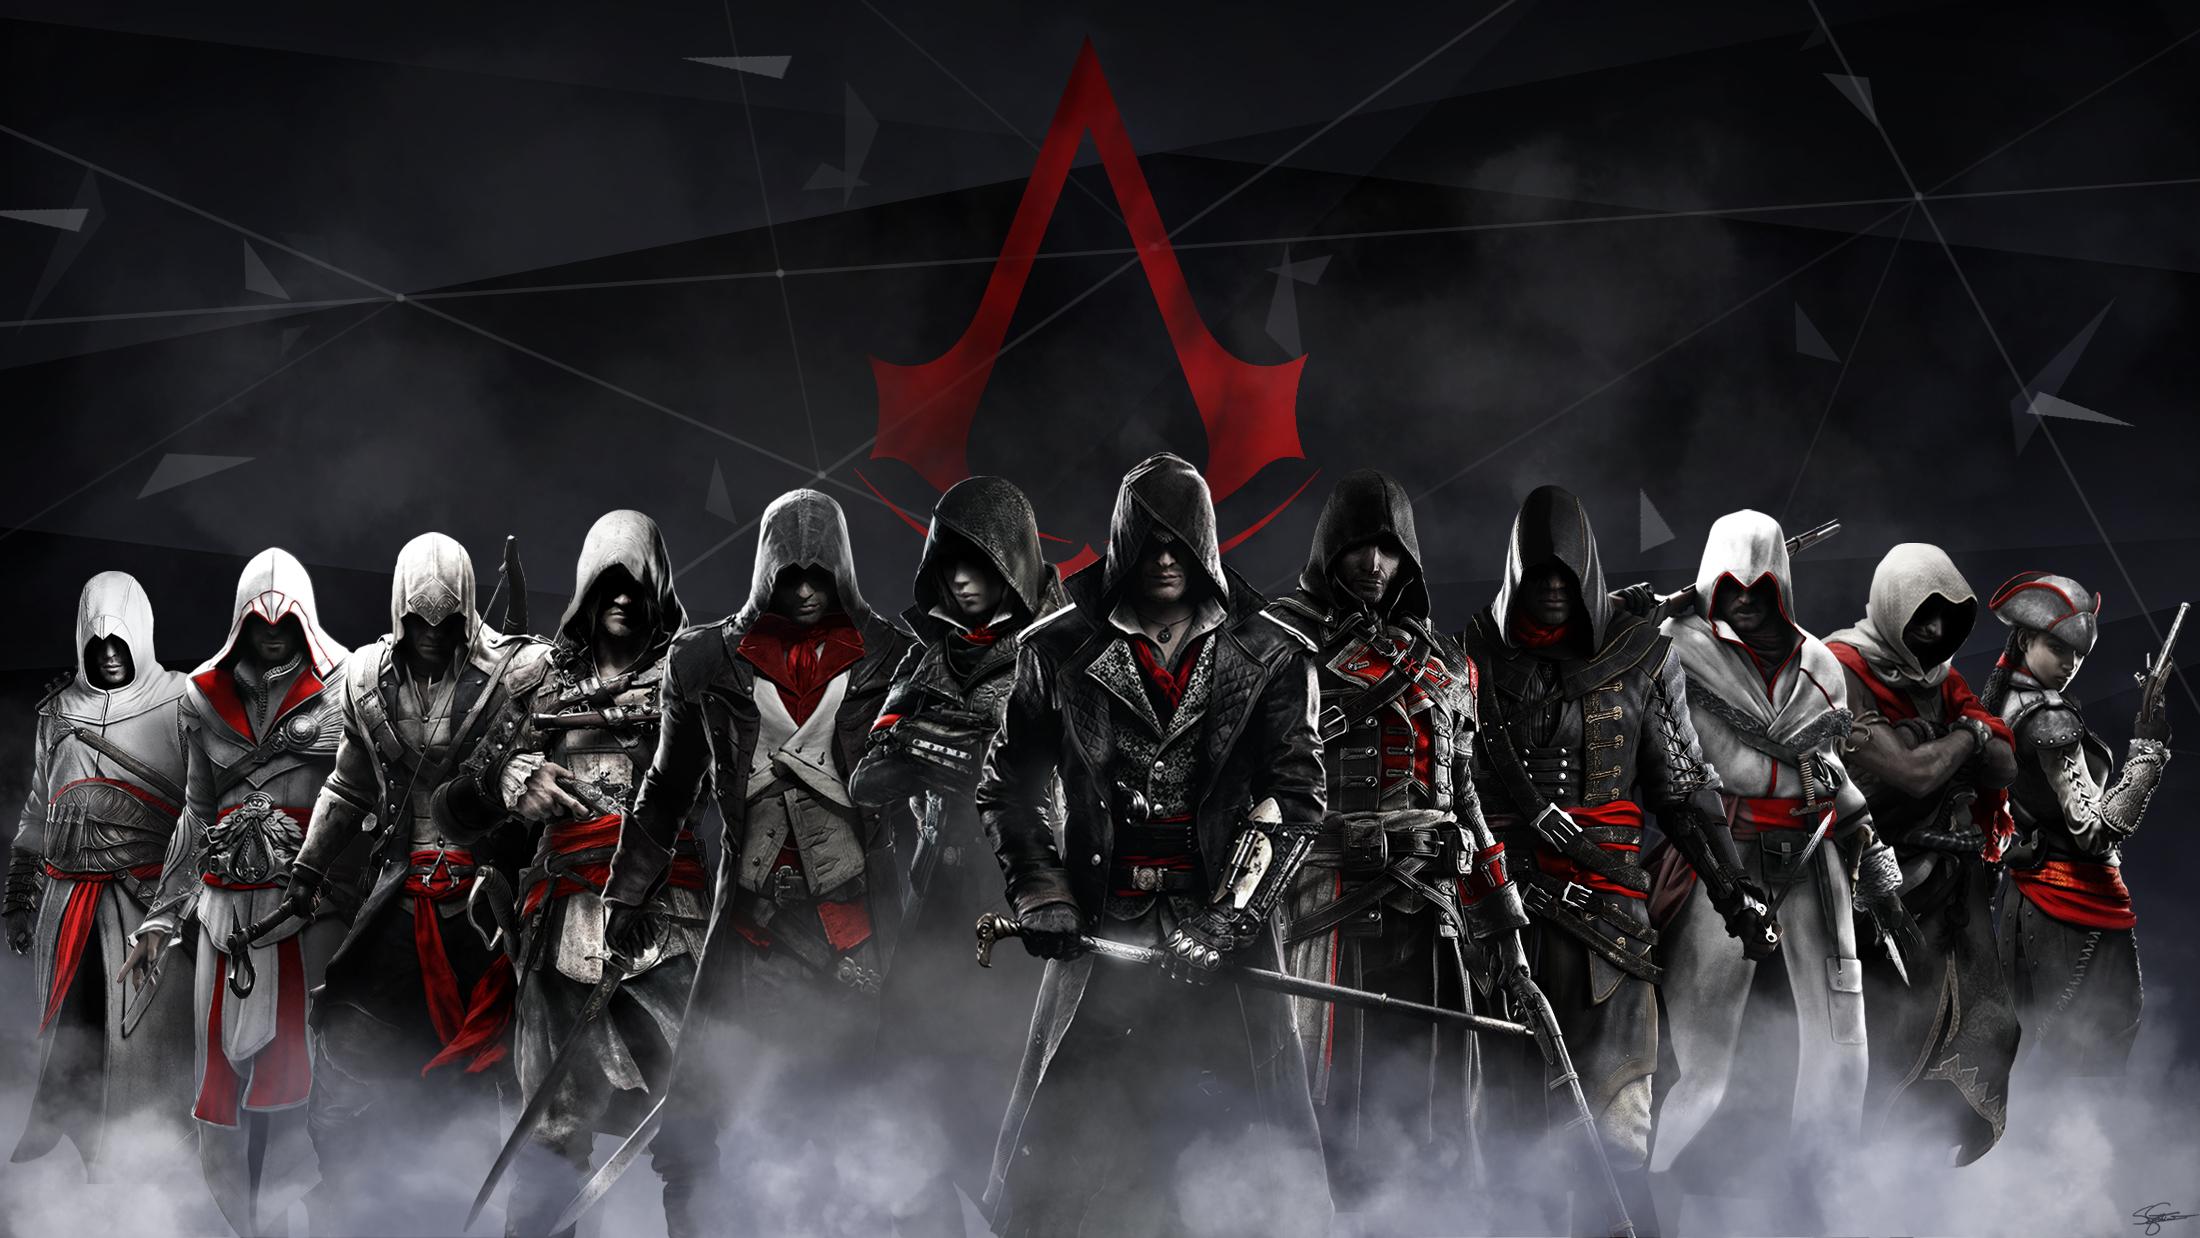 Assassins Creed Wallpaper HD - WallpaperSafari